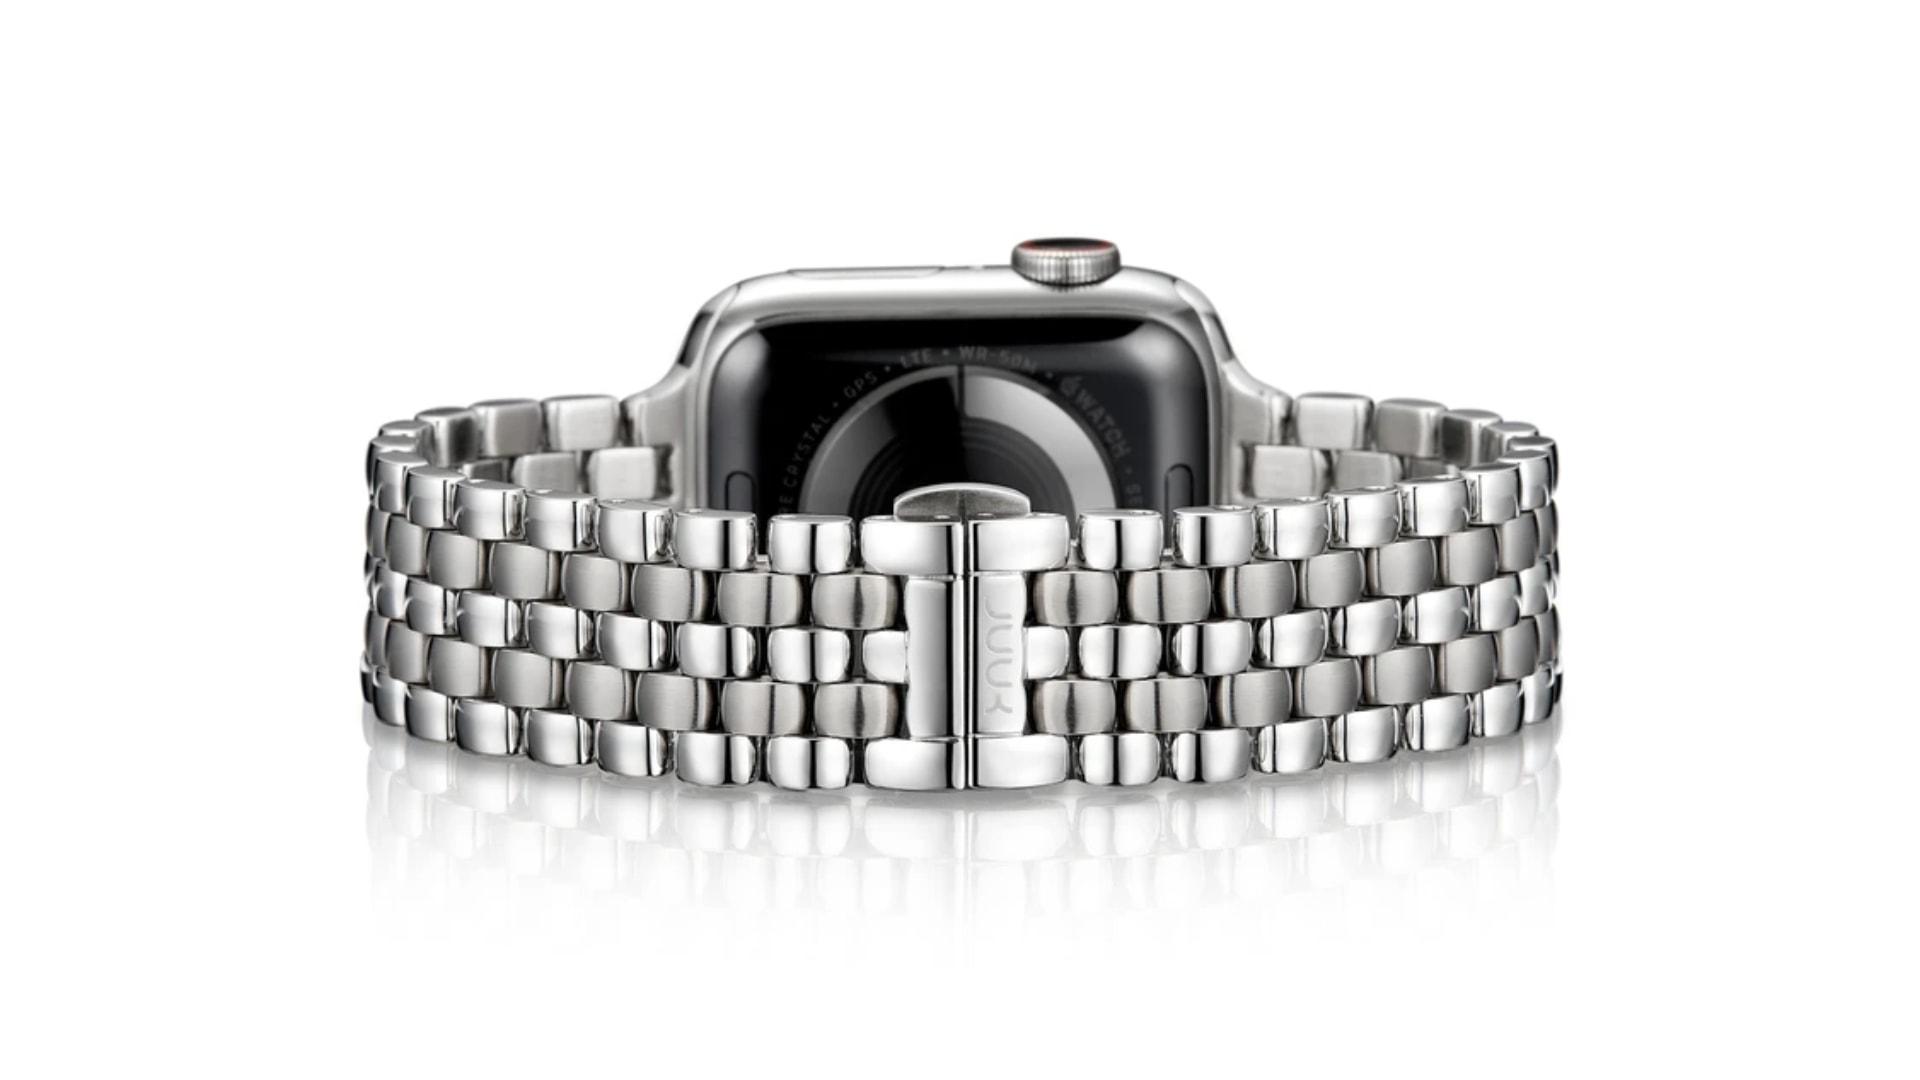 Juuk Aruna for Apple Watch in silver